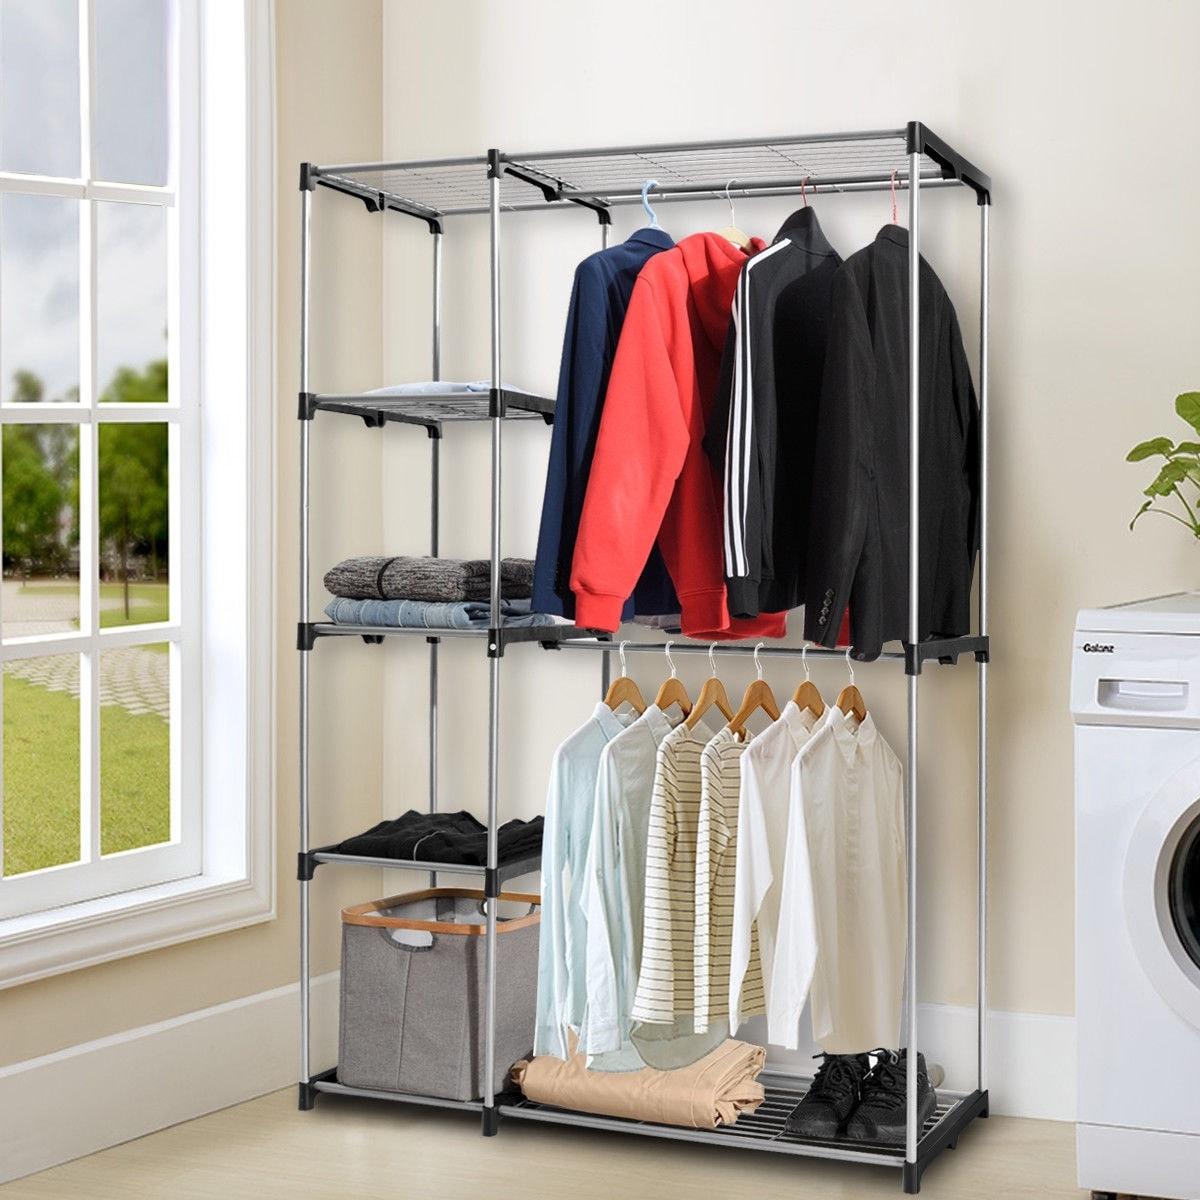 Gymax Closet Organizer Garment Rack Portable Clothes Hanger Storage Rack Home Shelf As Pic